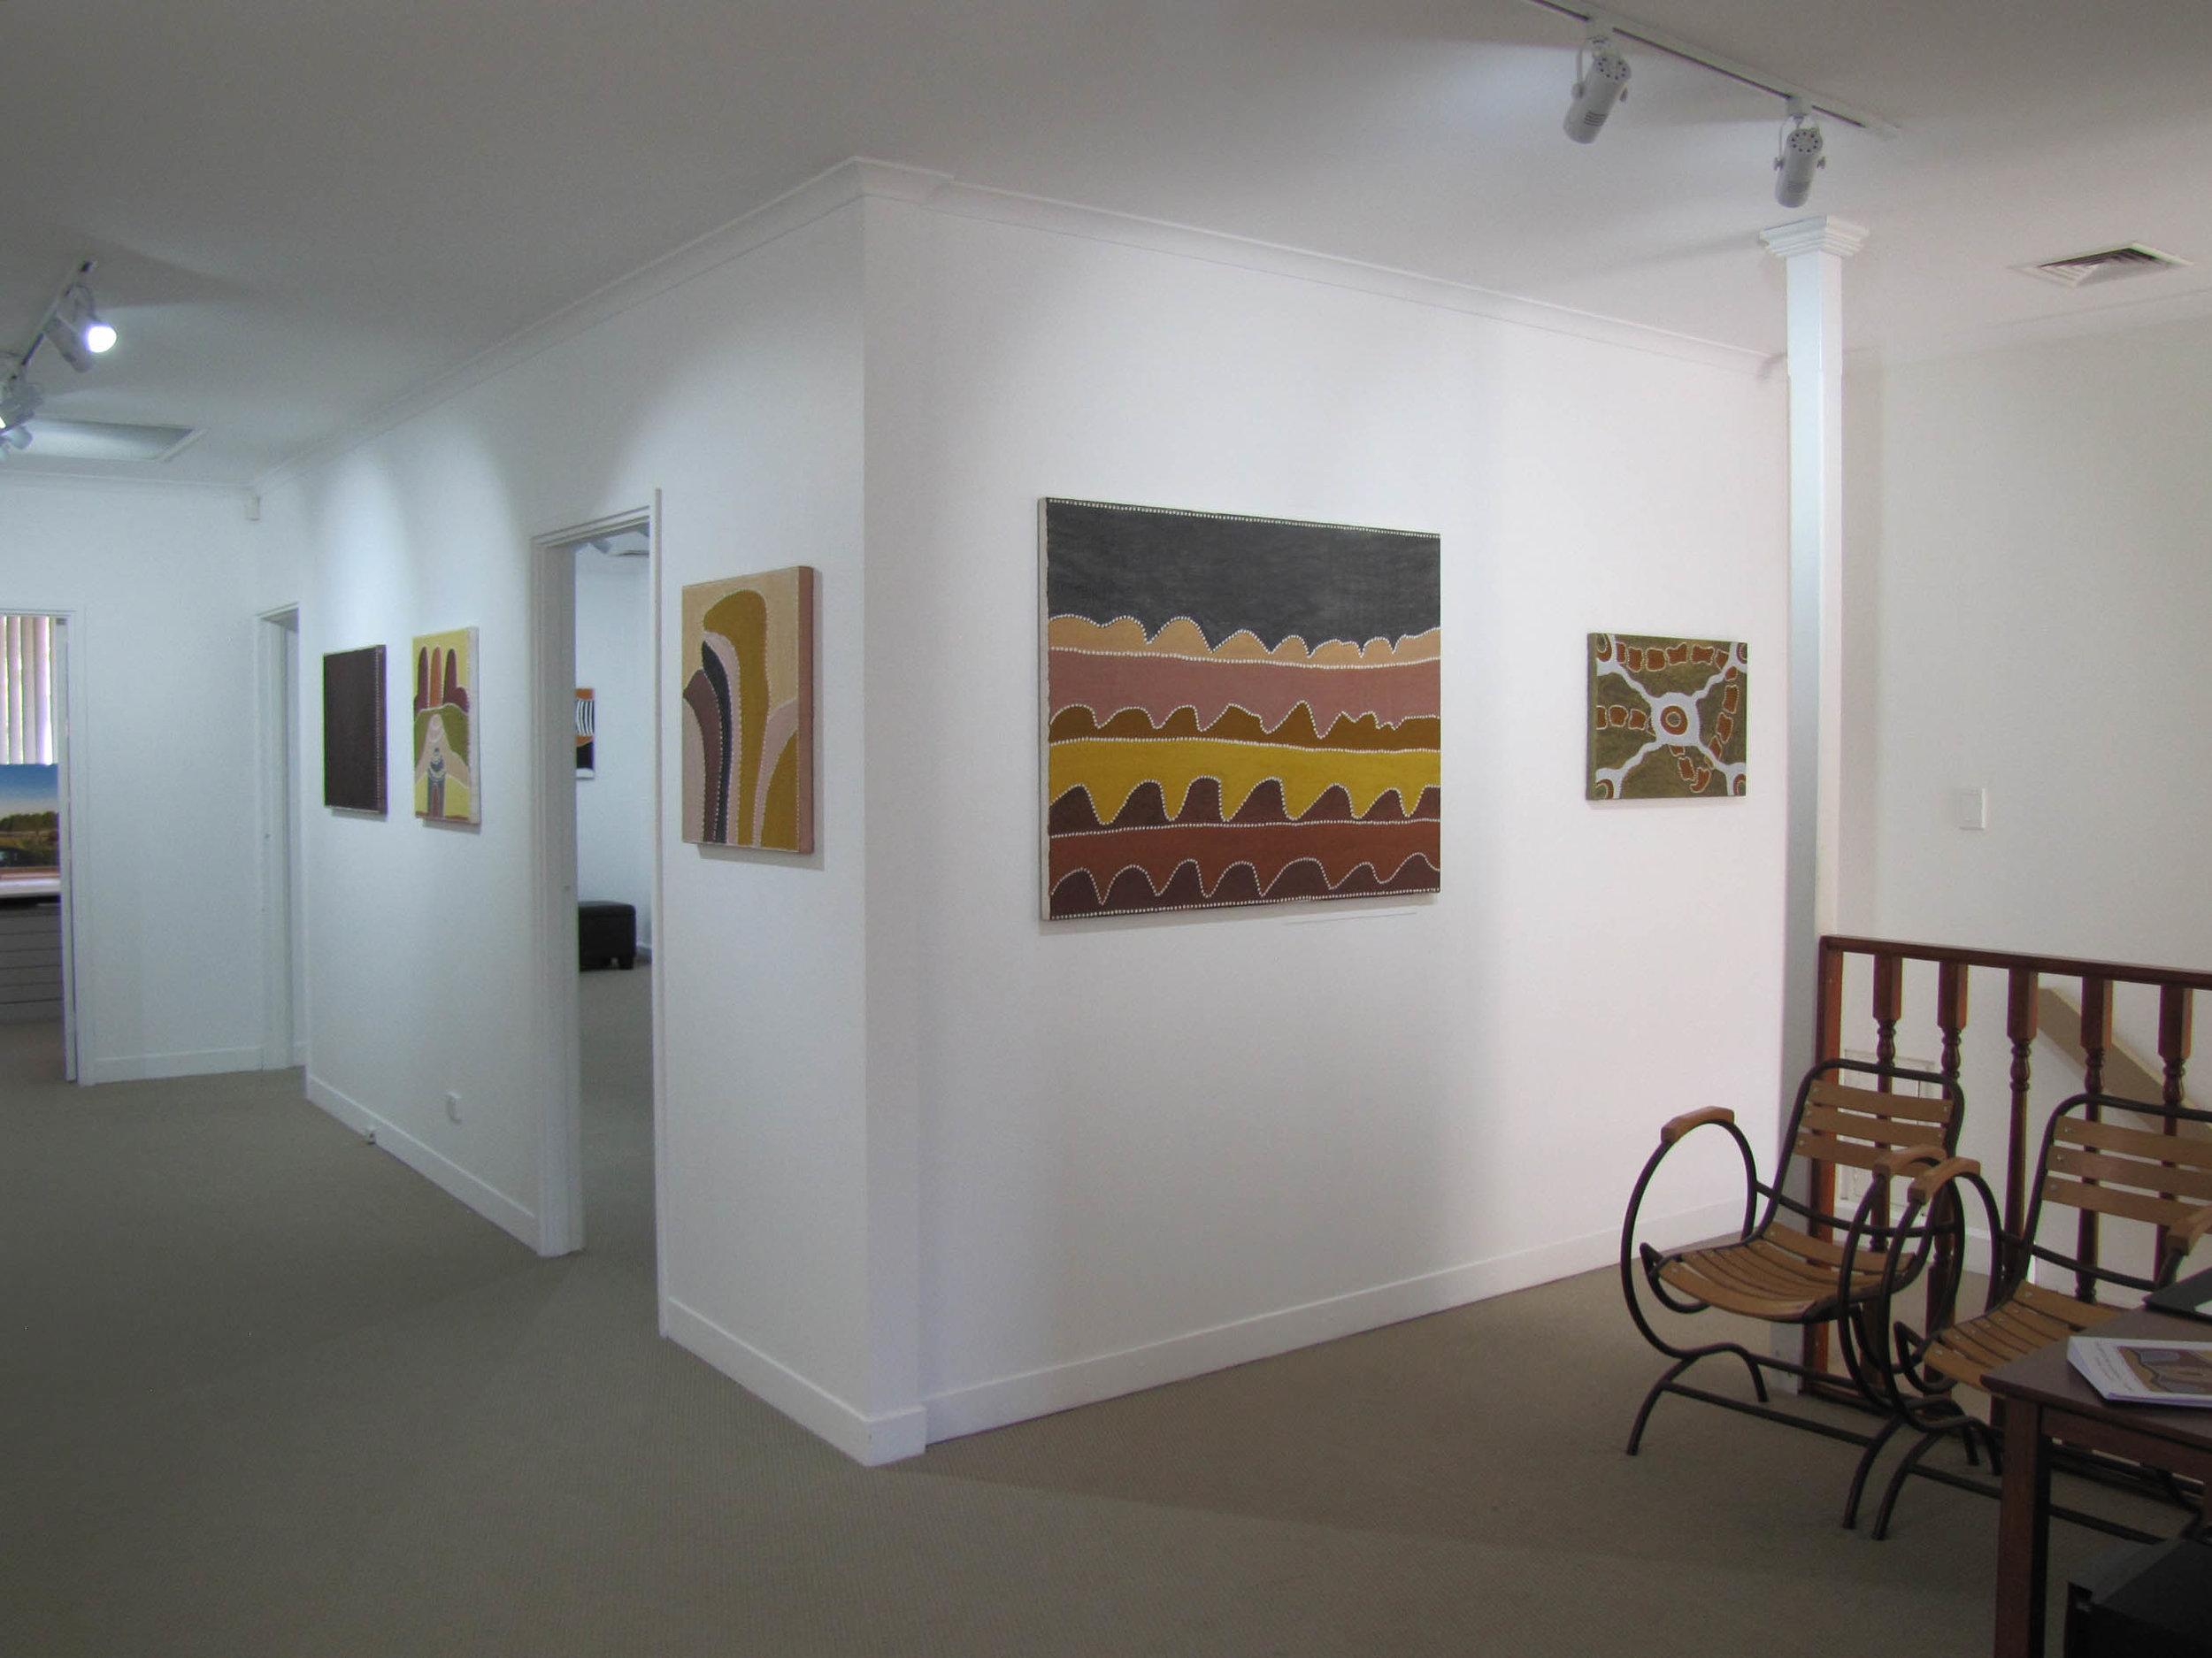 NSG. Warmun 4 exhibition. Exhibition views 8.jpg